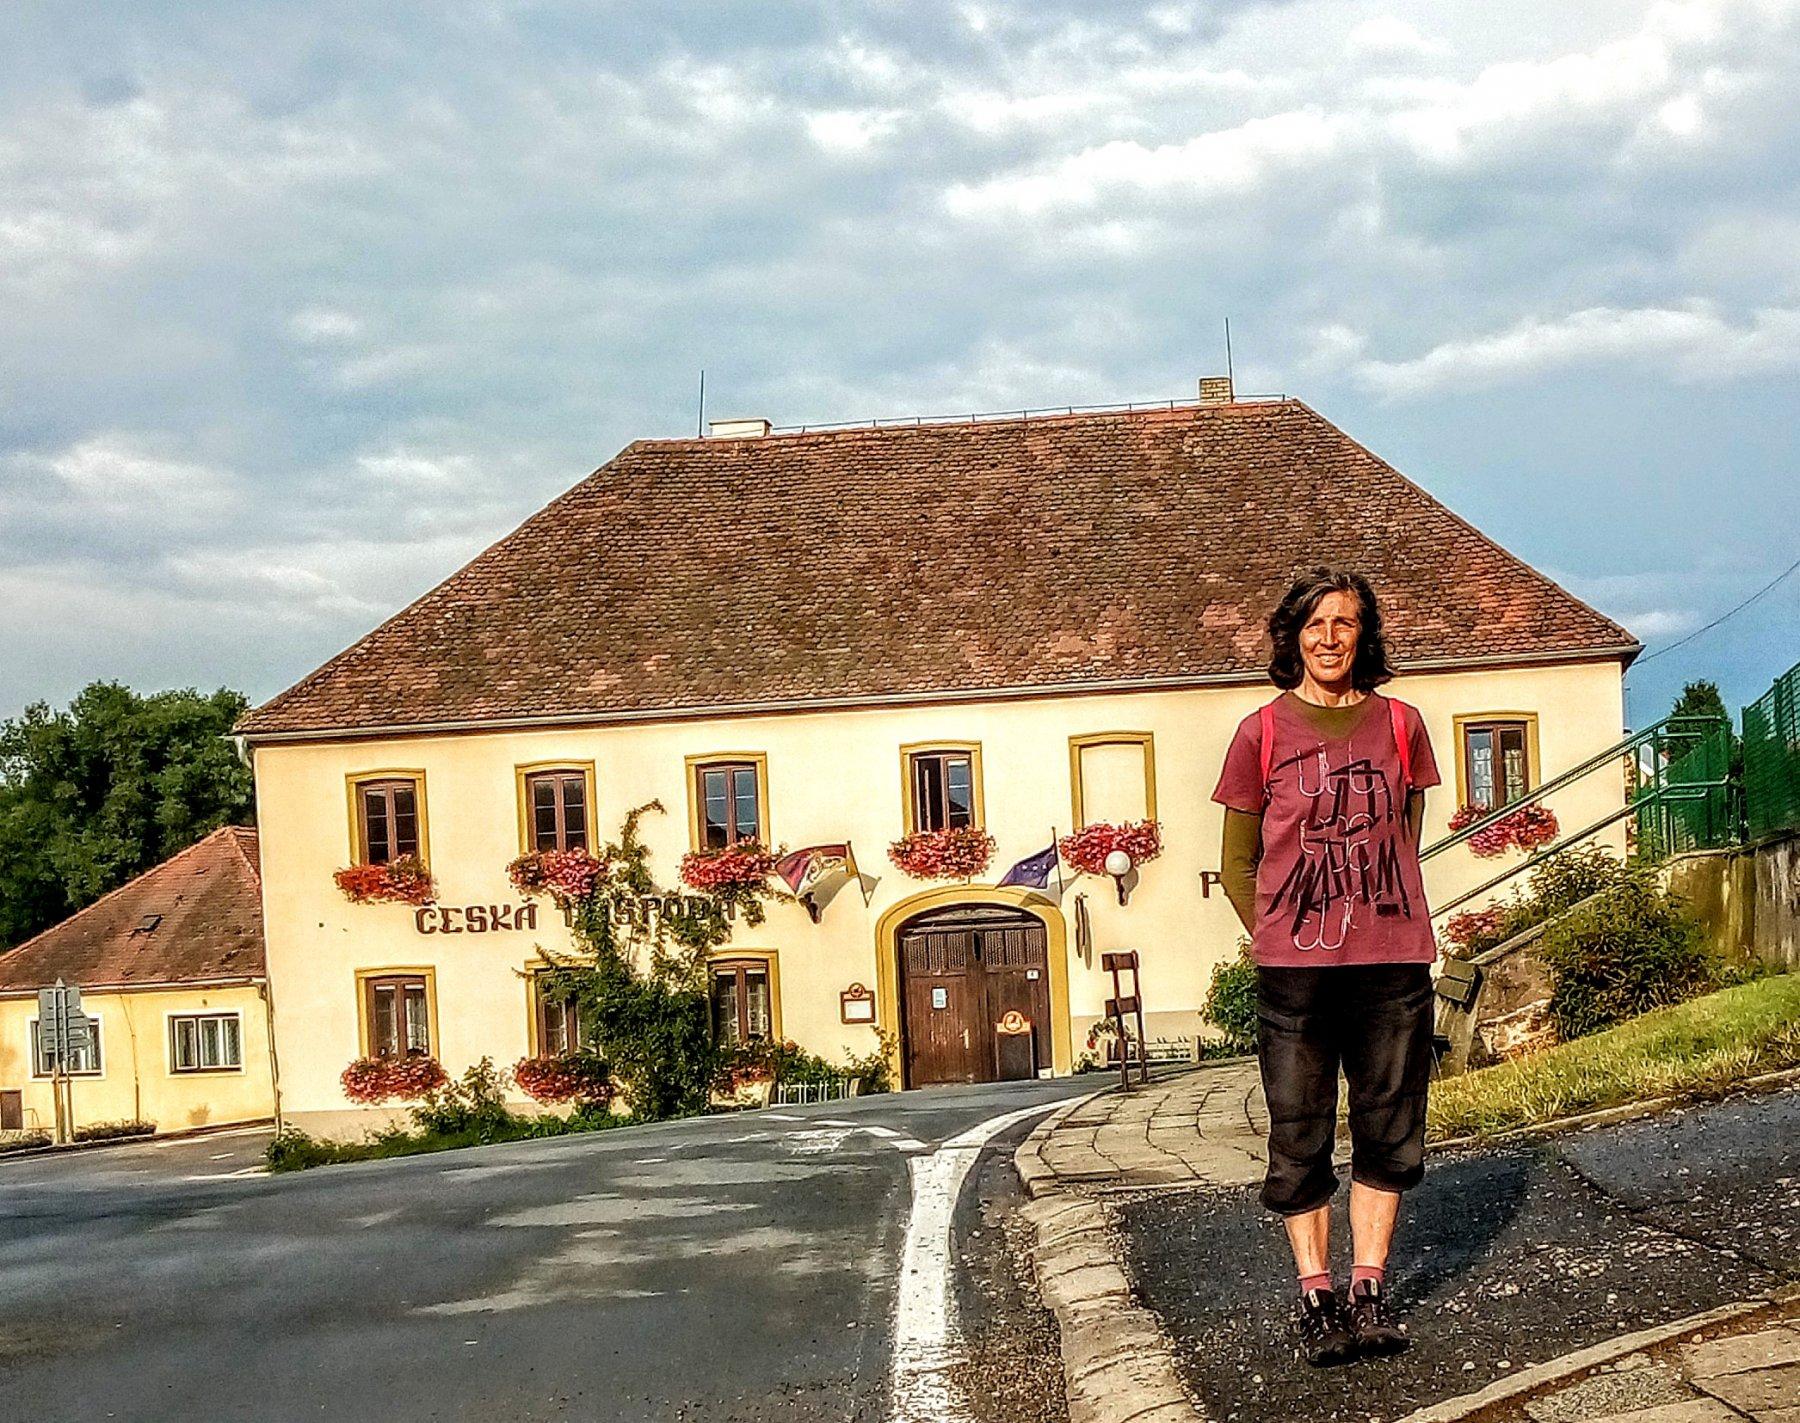 Thayarubde da Waidhofen 2019-07-31